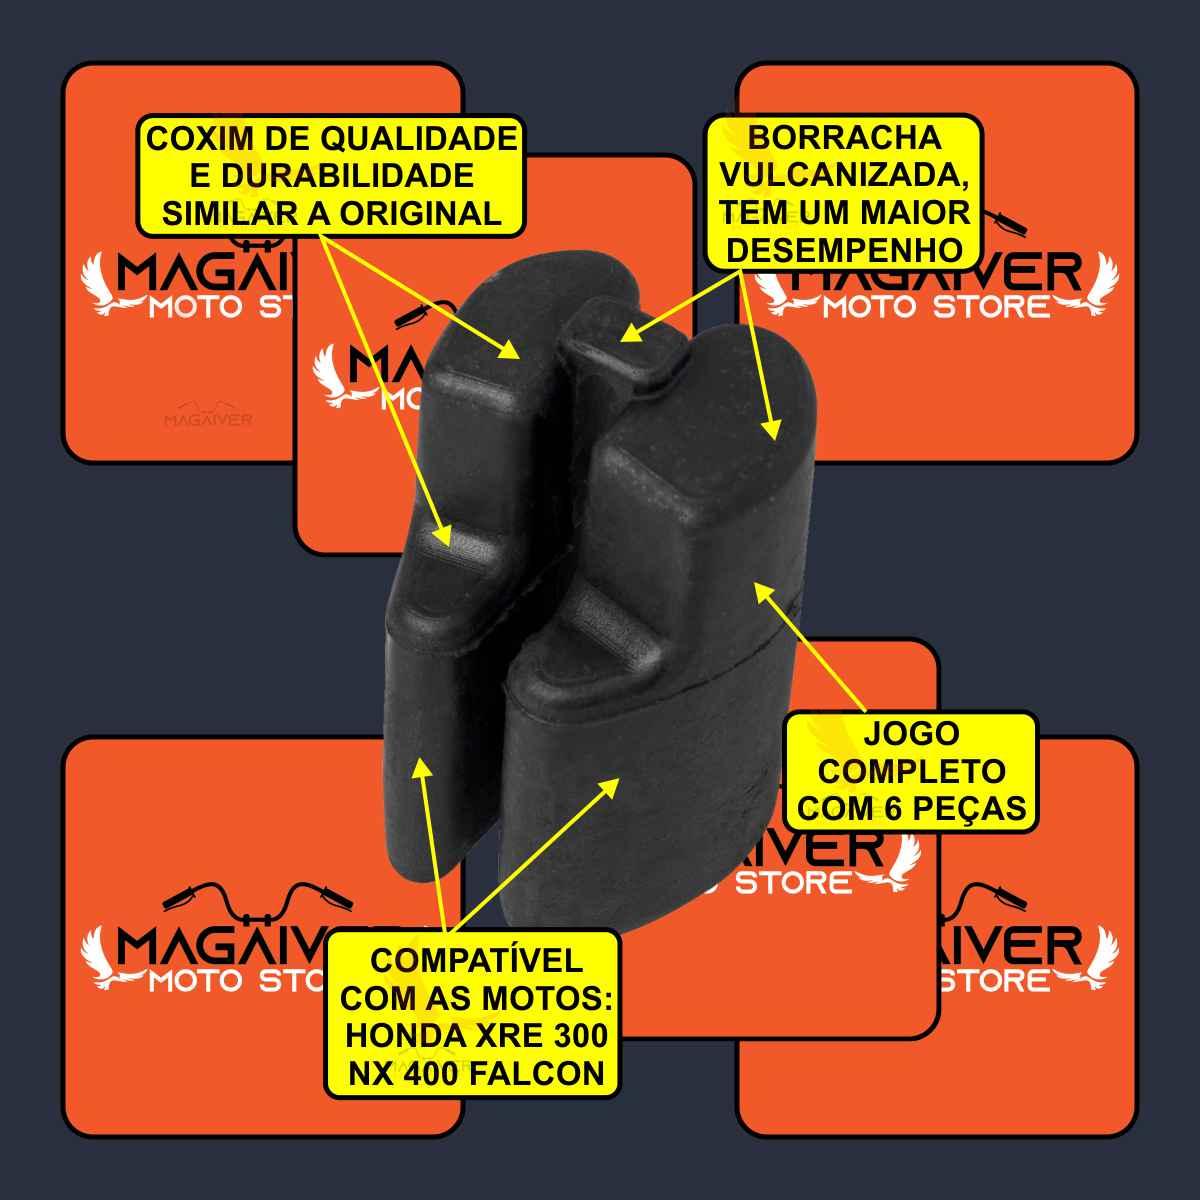 JOGO COXIM BORRACHA BUCHA DA COROA CUBO RODA TRASEIRO MOTO NX 400 FALCON XRE 300 + GRAXA SPRAY 60ml